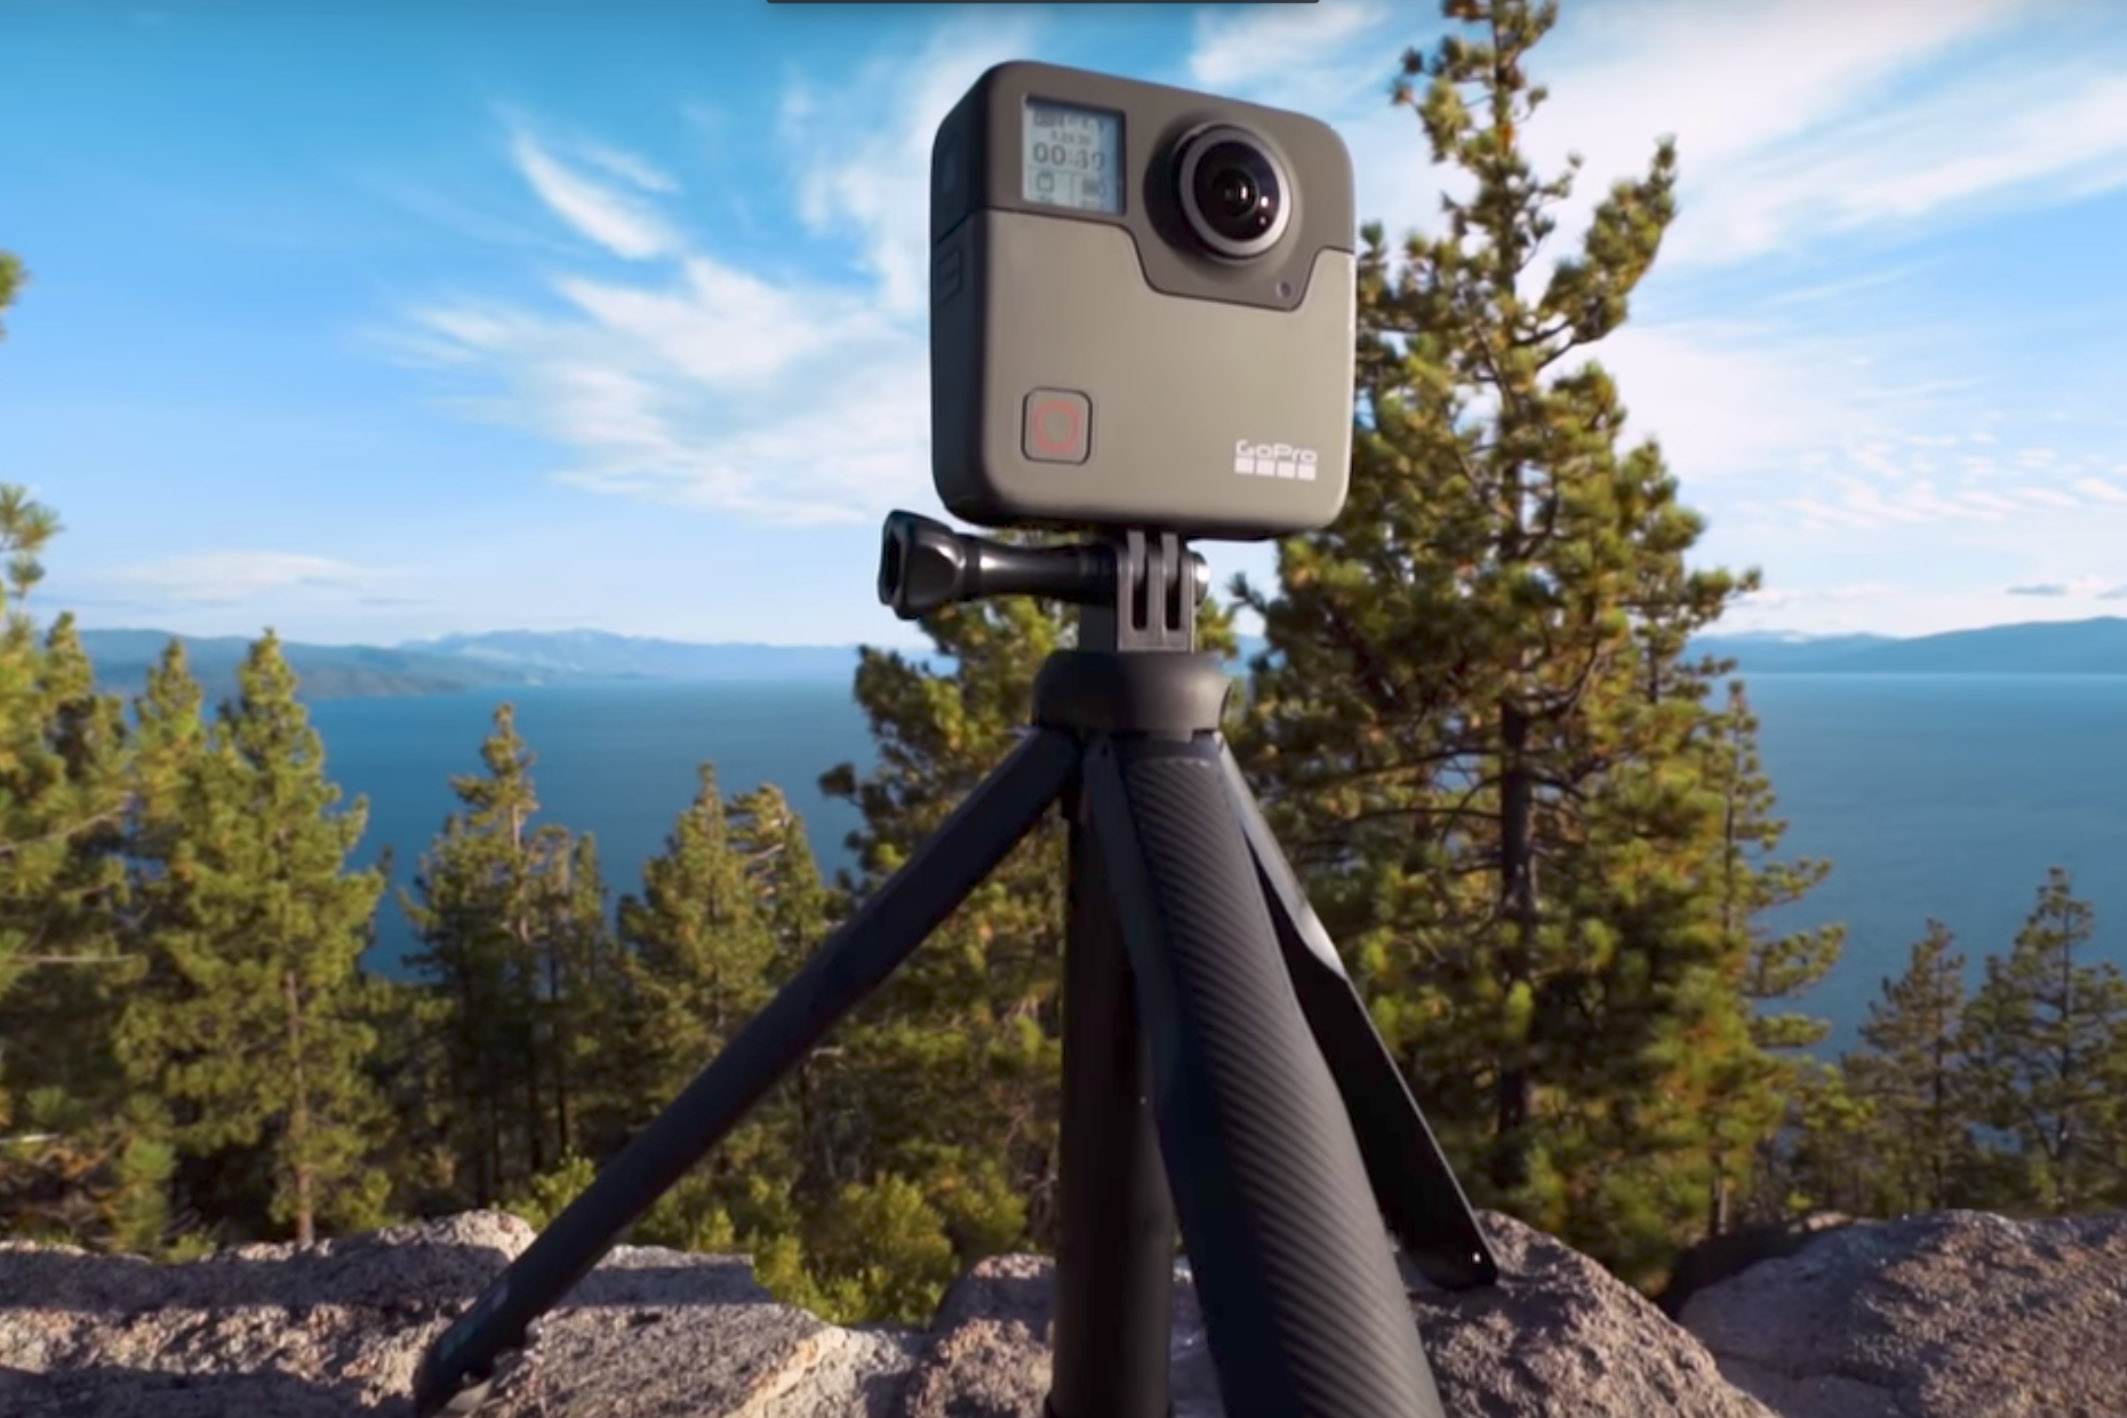 28сентября GoPro представили 3 новинки: Камеру GoPro 6, обновленнный дрон Karma исовершенно новую 360 камеру Fusion.